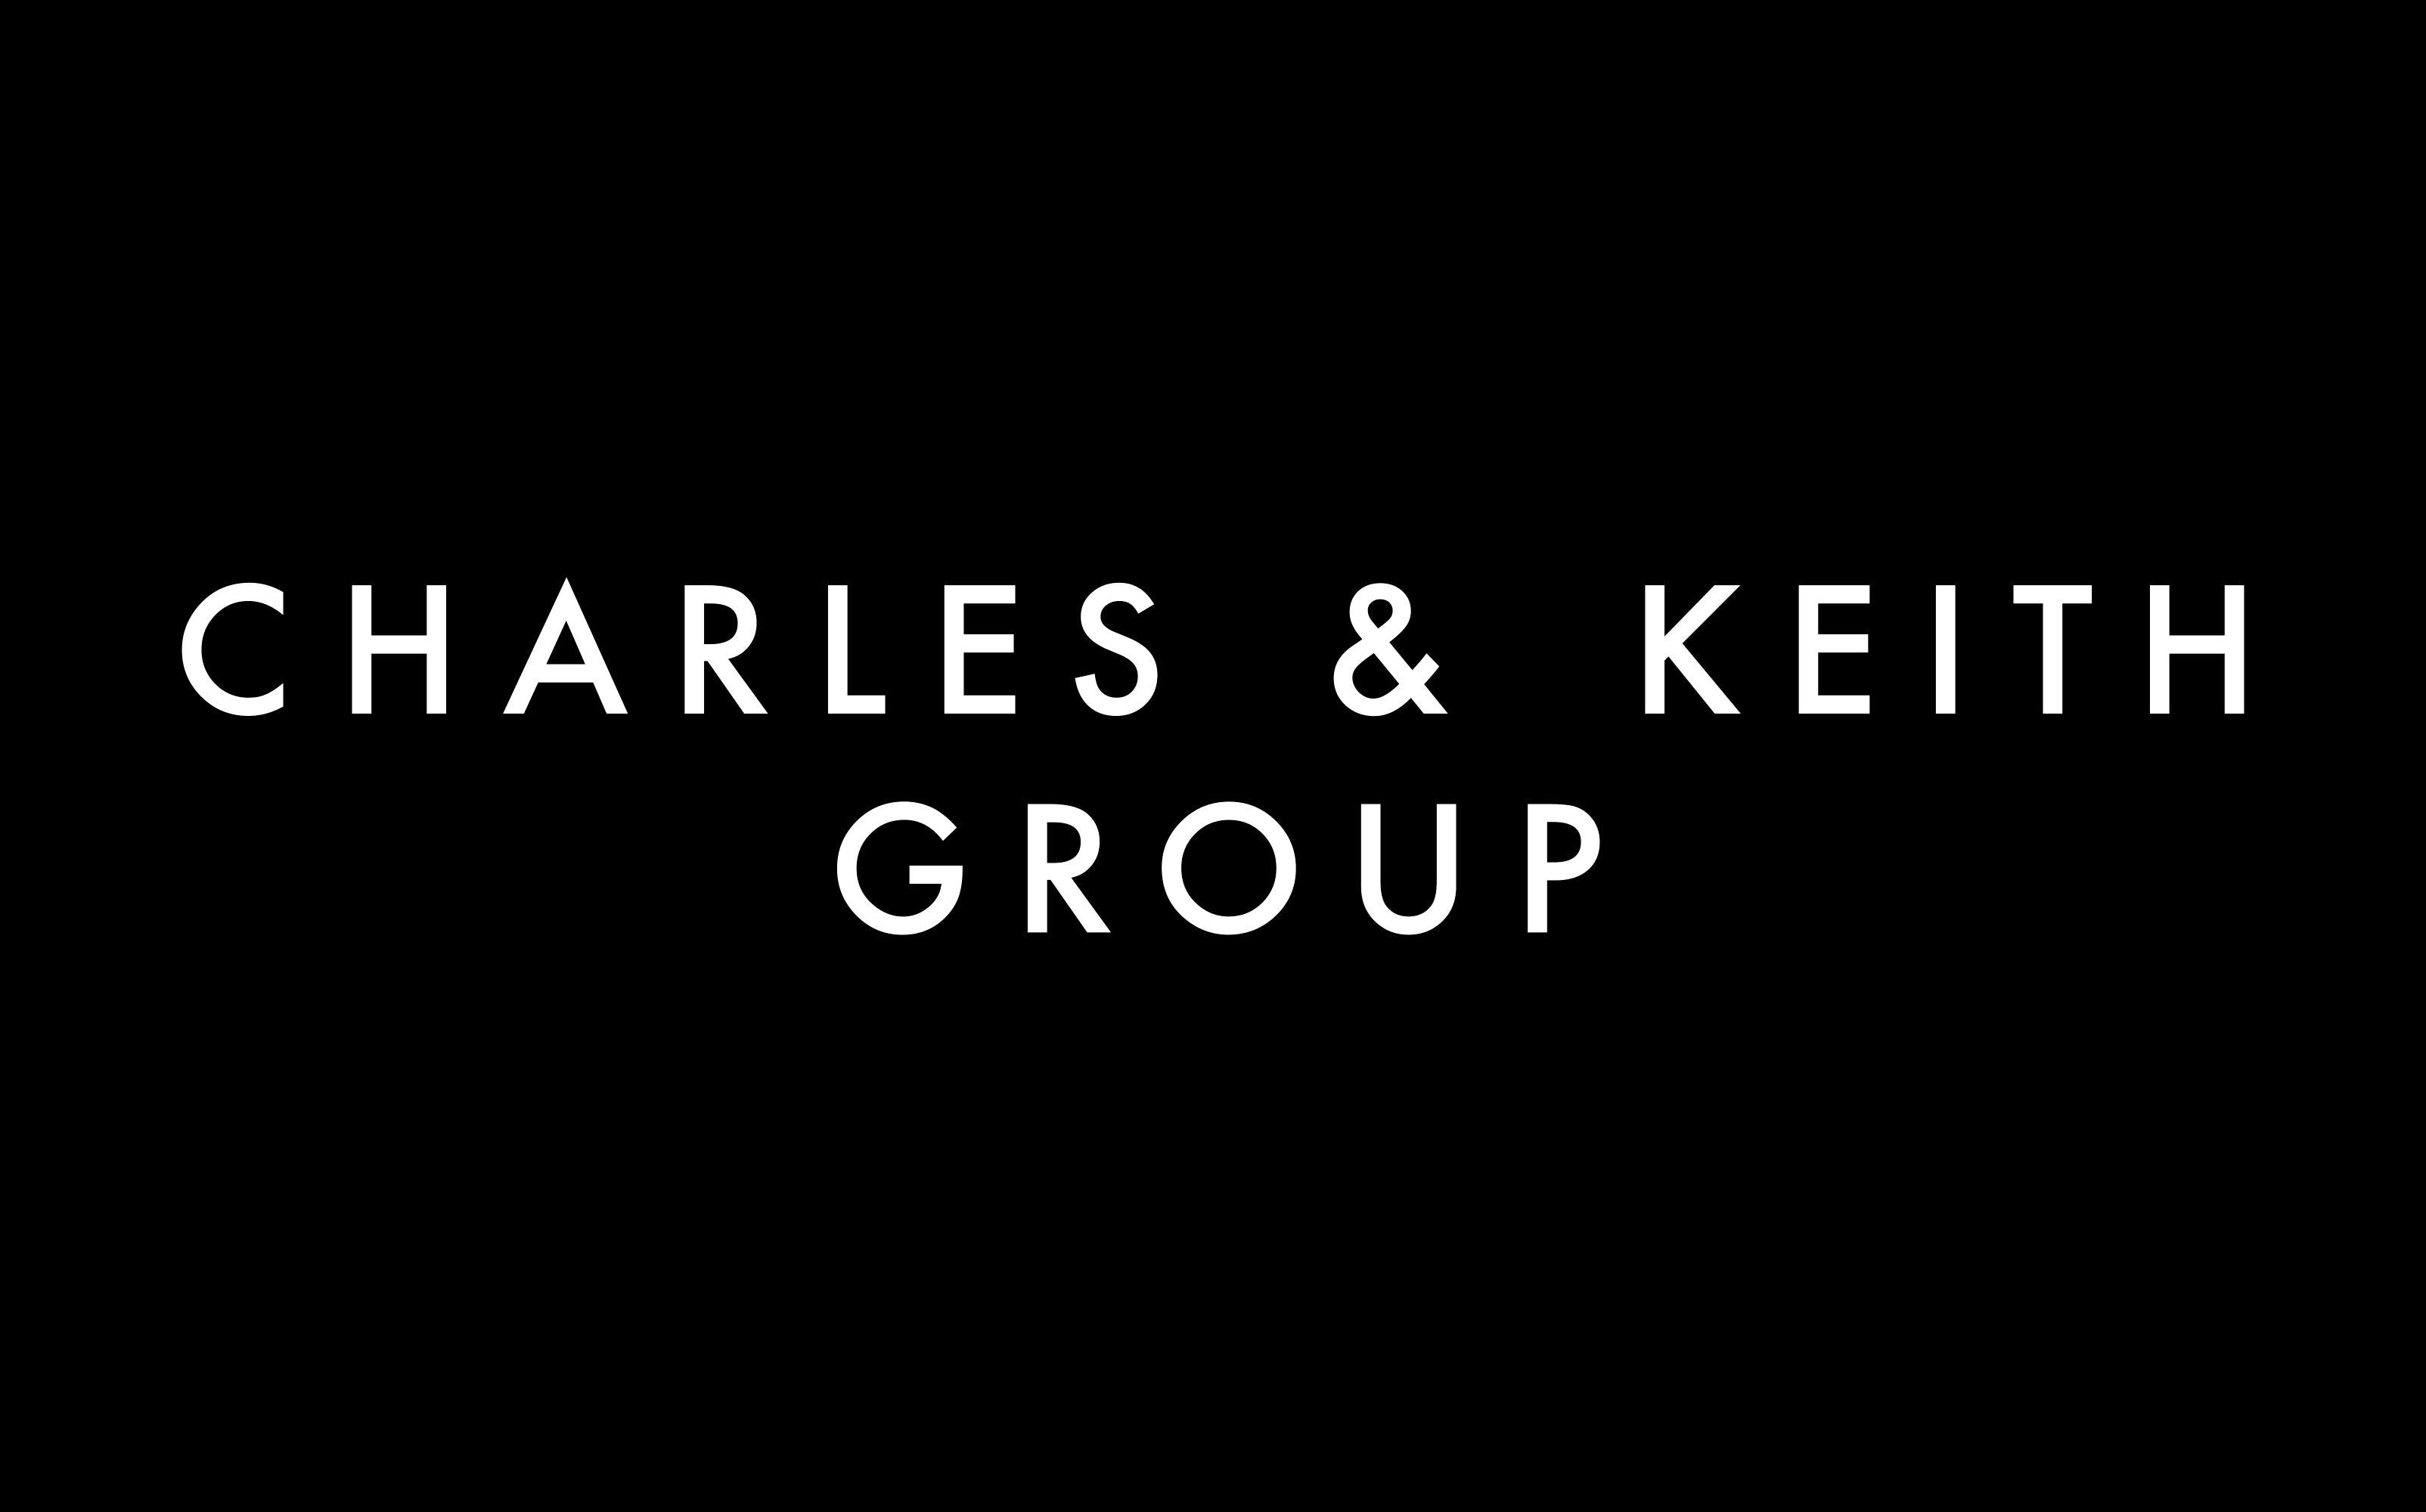 Charles & Keith Group company logo